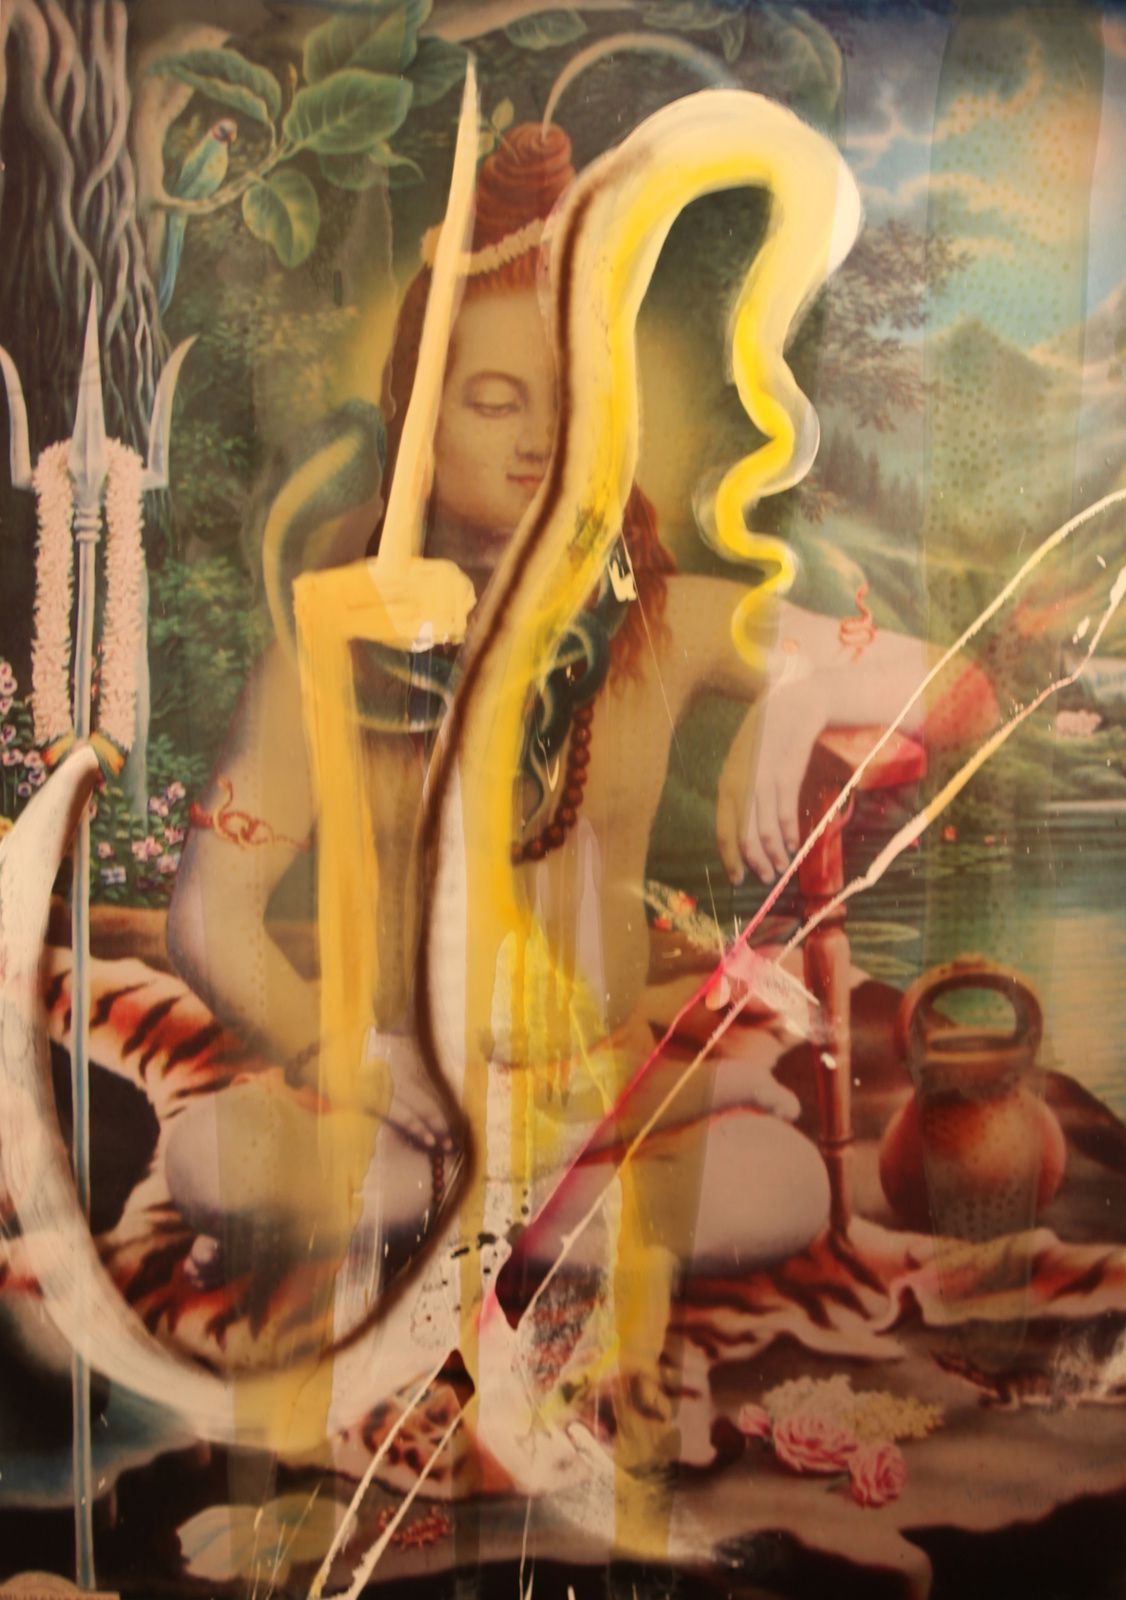 """Untitled (SHIVA)"", 2008 de Julian SCHNABEL - Courtesy Galerie Daniel Templon © Photo Éric Simon"